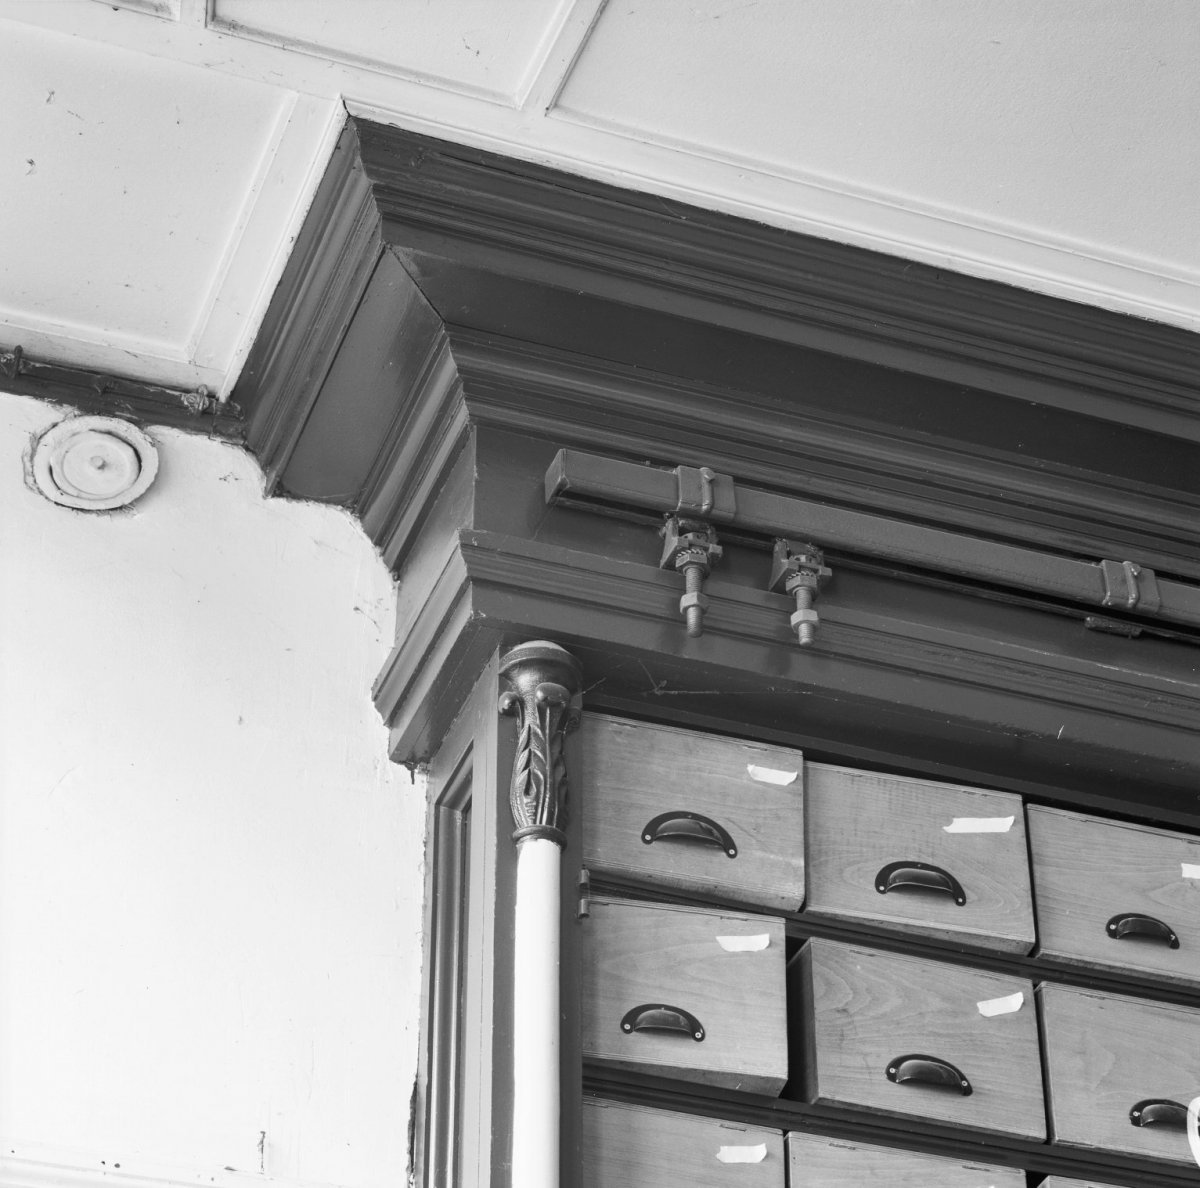 File interieur winkel kroonlijst detail deventer for Interieur winkels